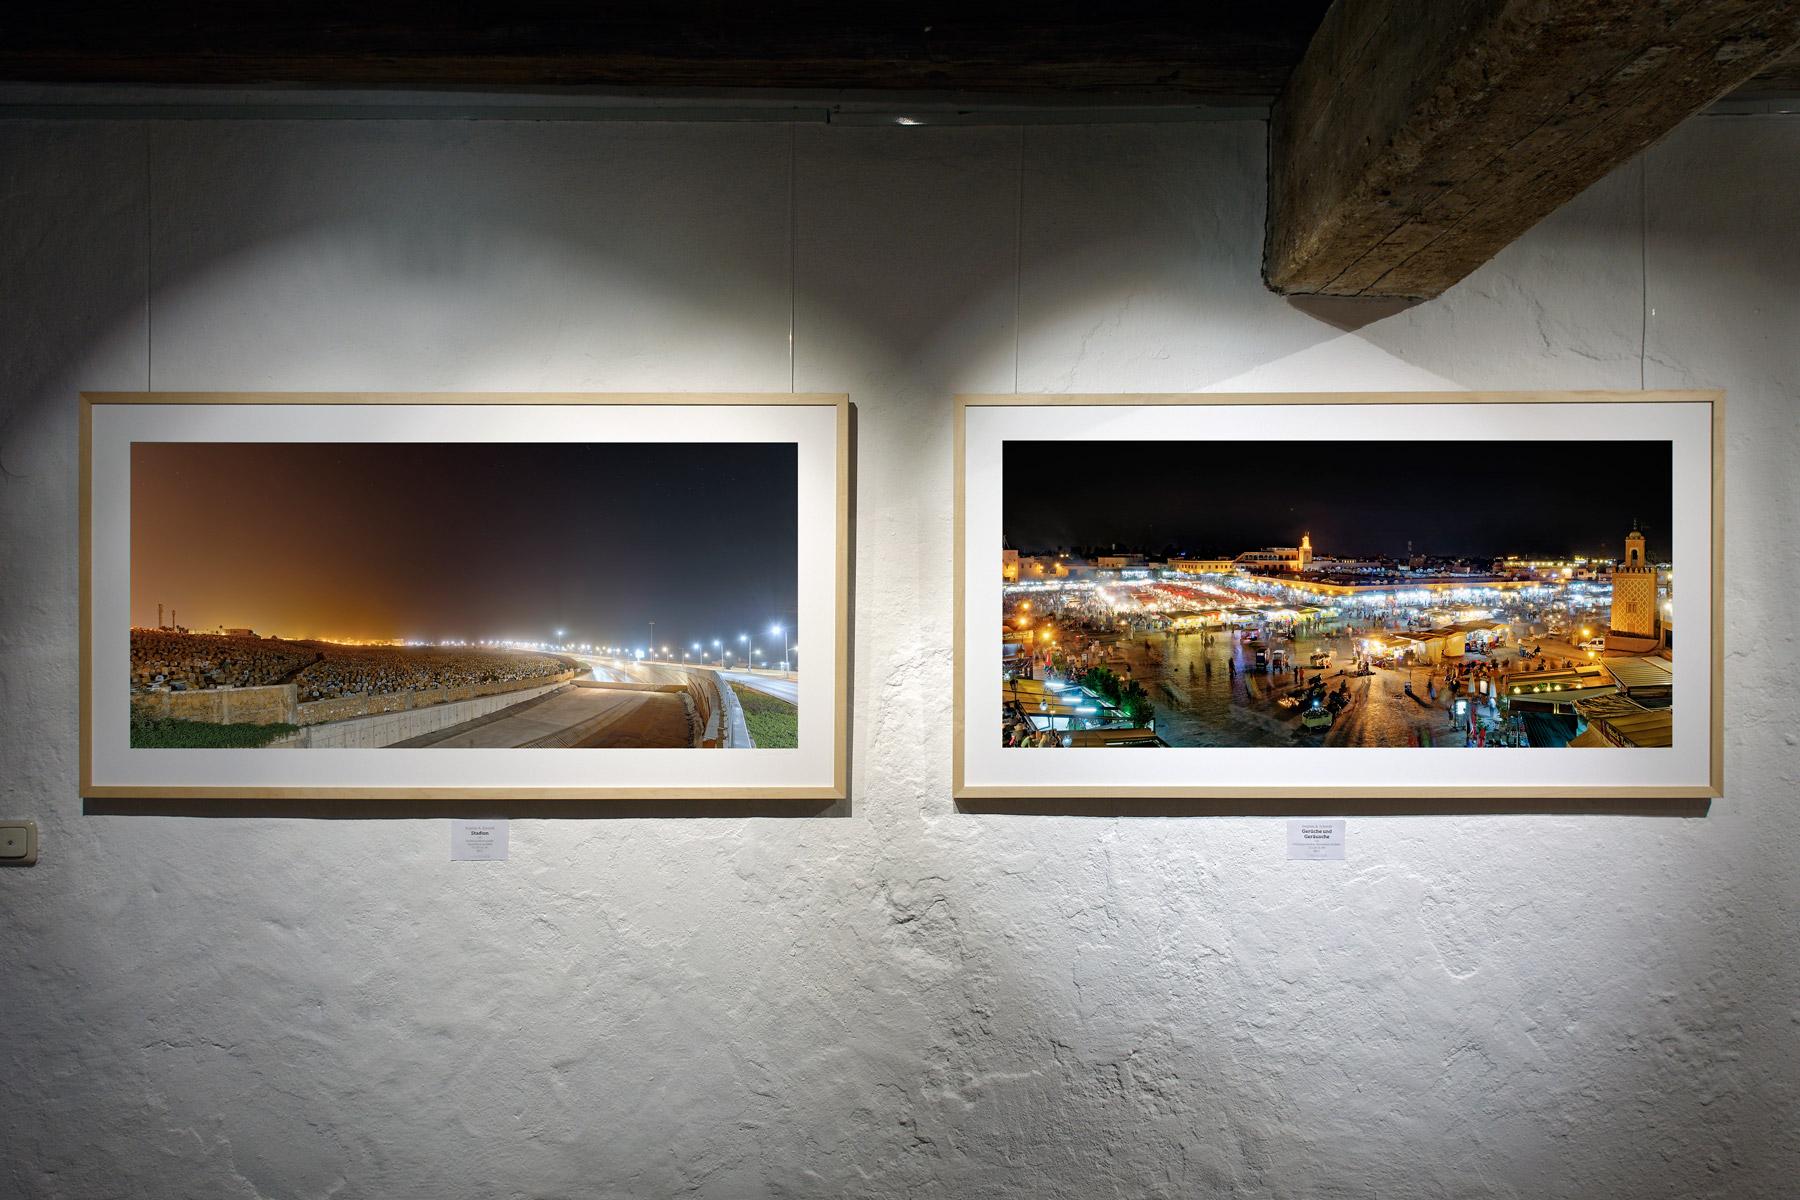 "Photo"" – meine Fotos – Stephan A. Schmidt"